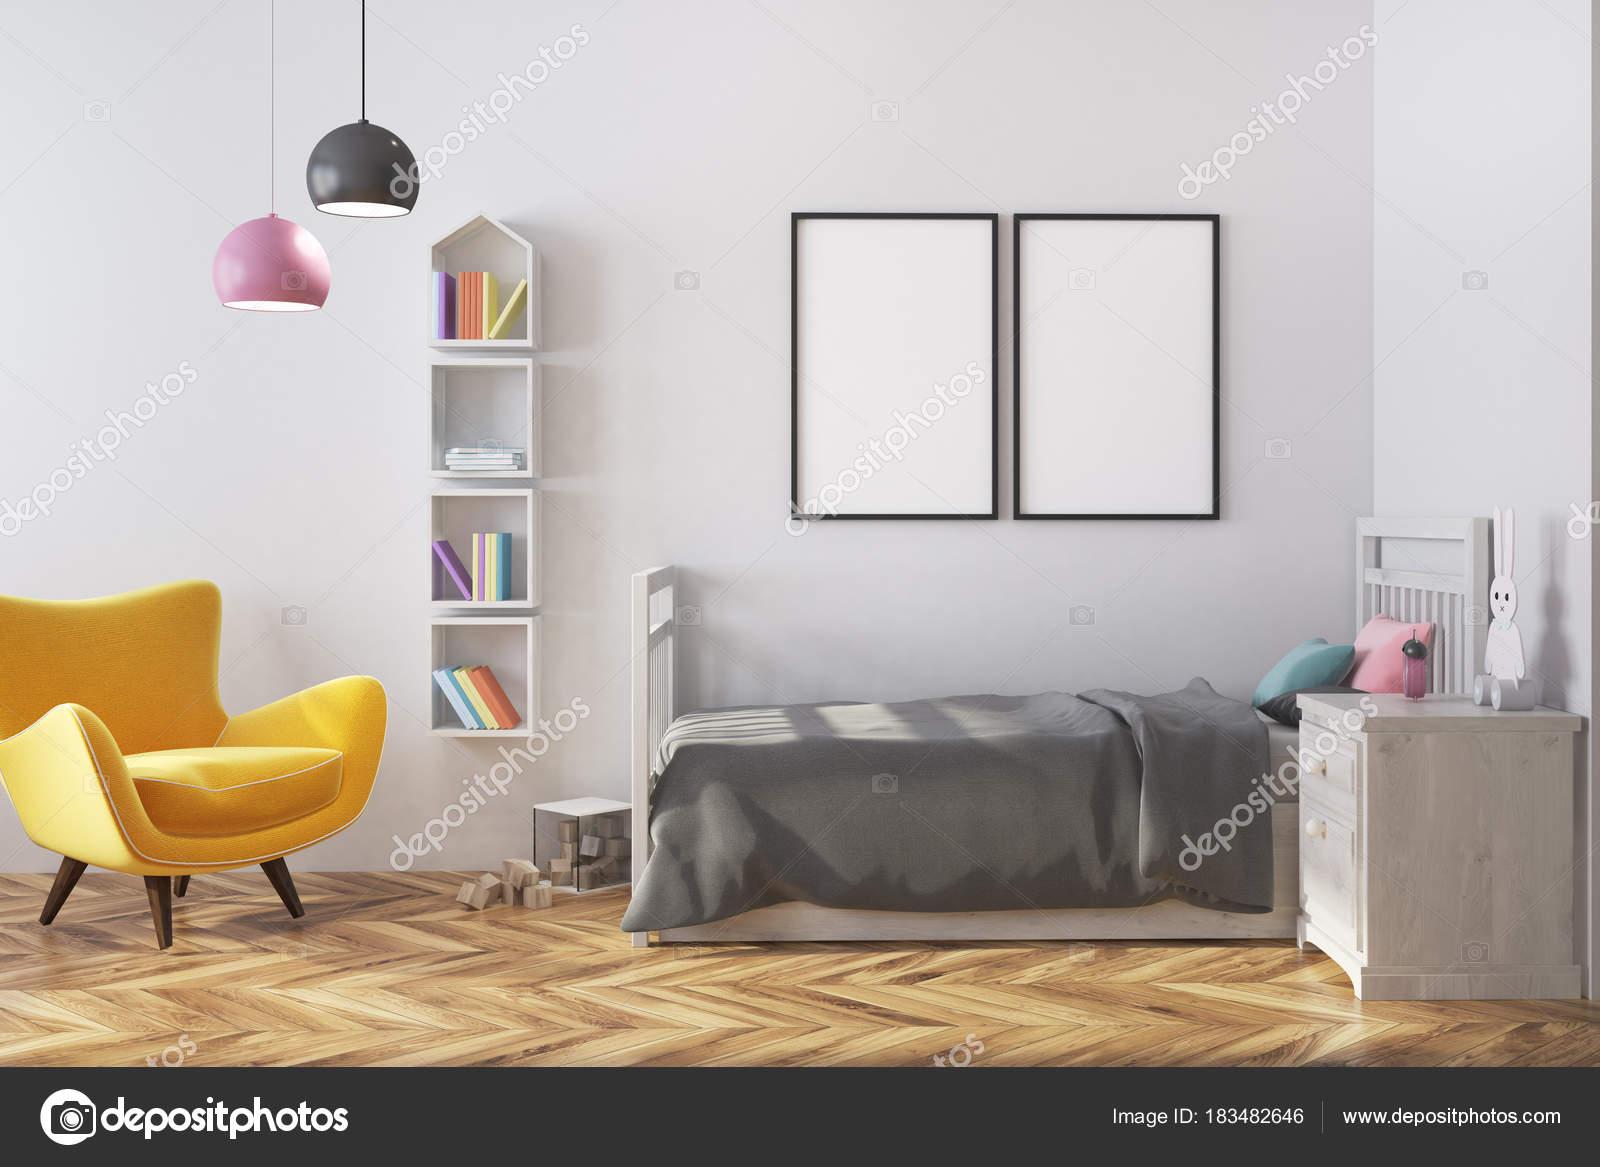 Posters In Interieur : Kindergarten interieur sessel und poster u stockfoto